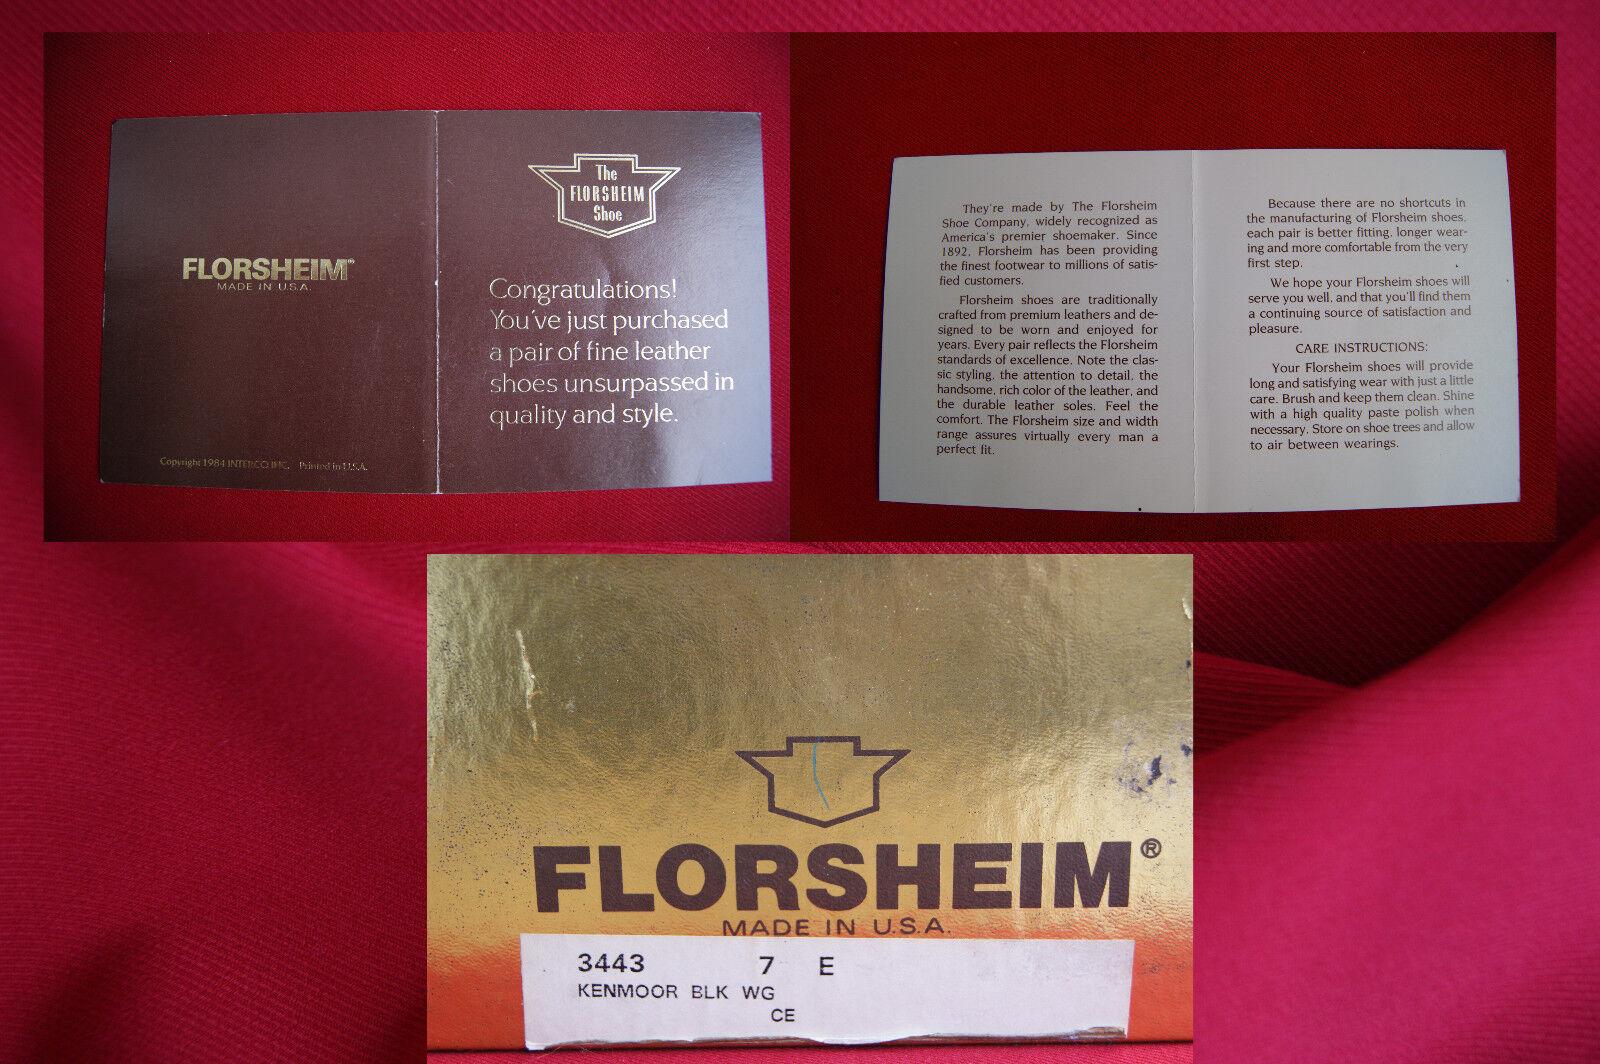 Florsheim Longwing Longwing Longwing US 7 e (40) Kenmoor V-Cleat USA NUOVO assoluta rarità OVP   Acquisti online    Scolaro/Ragazze Scarpa  b88e81